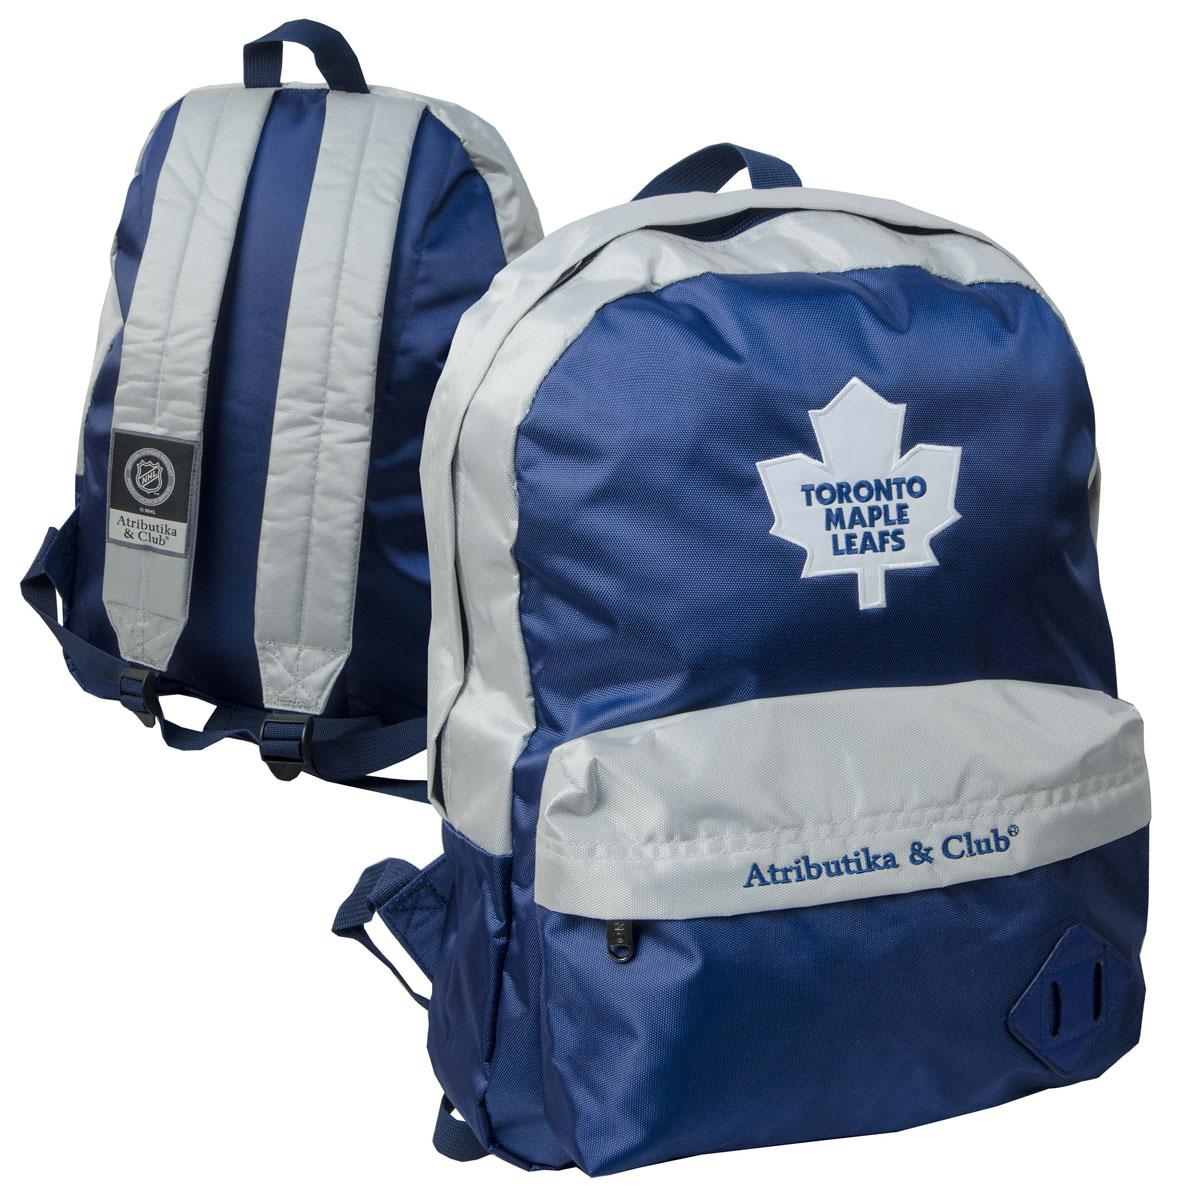 Рюкзак спортивный NHL Maple Leafs, цвет: сине-серый, 18 л. 58041 ( 58041 )